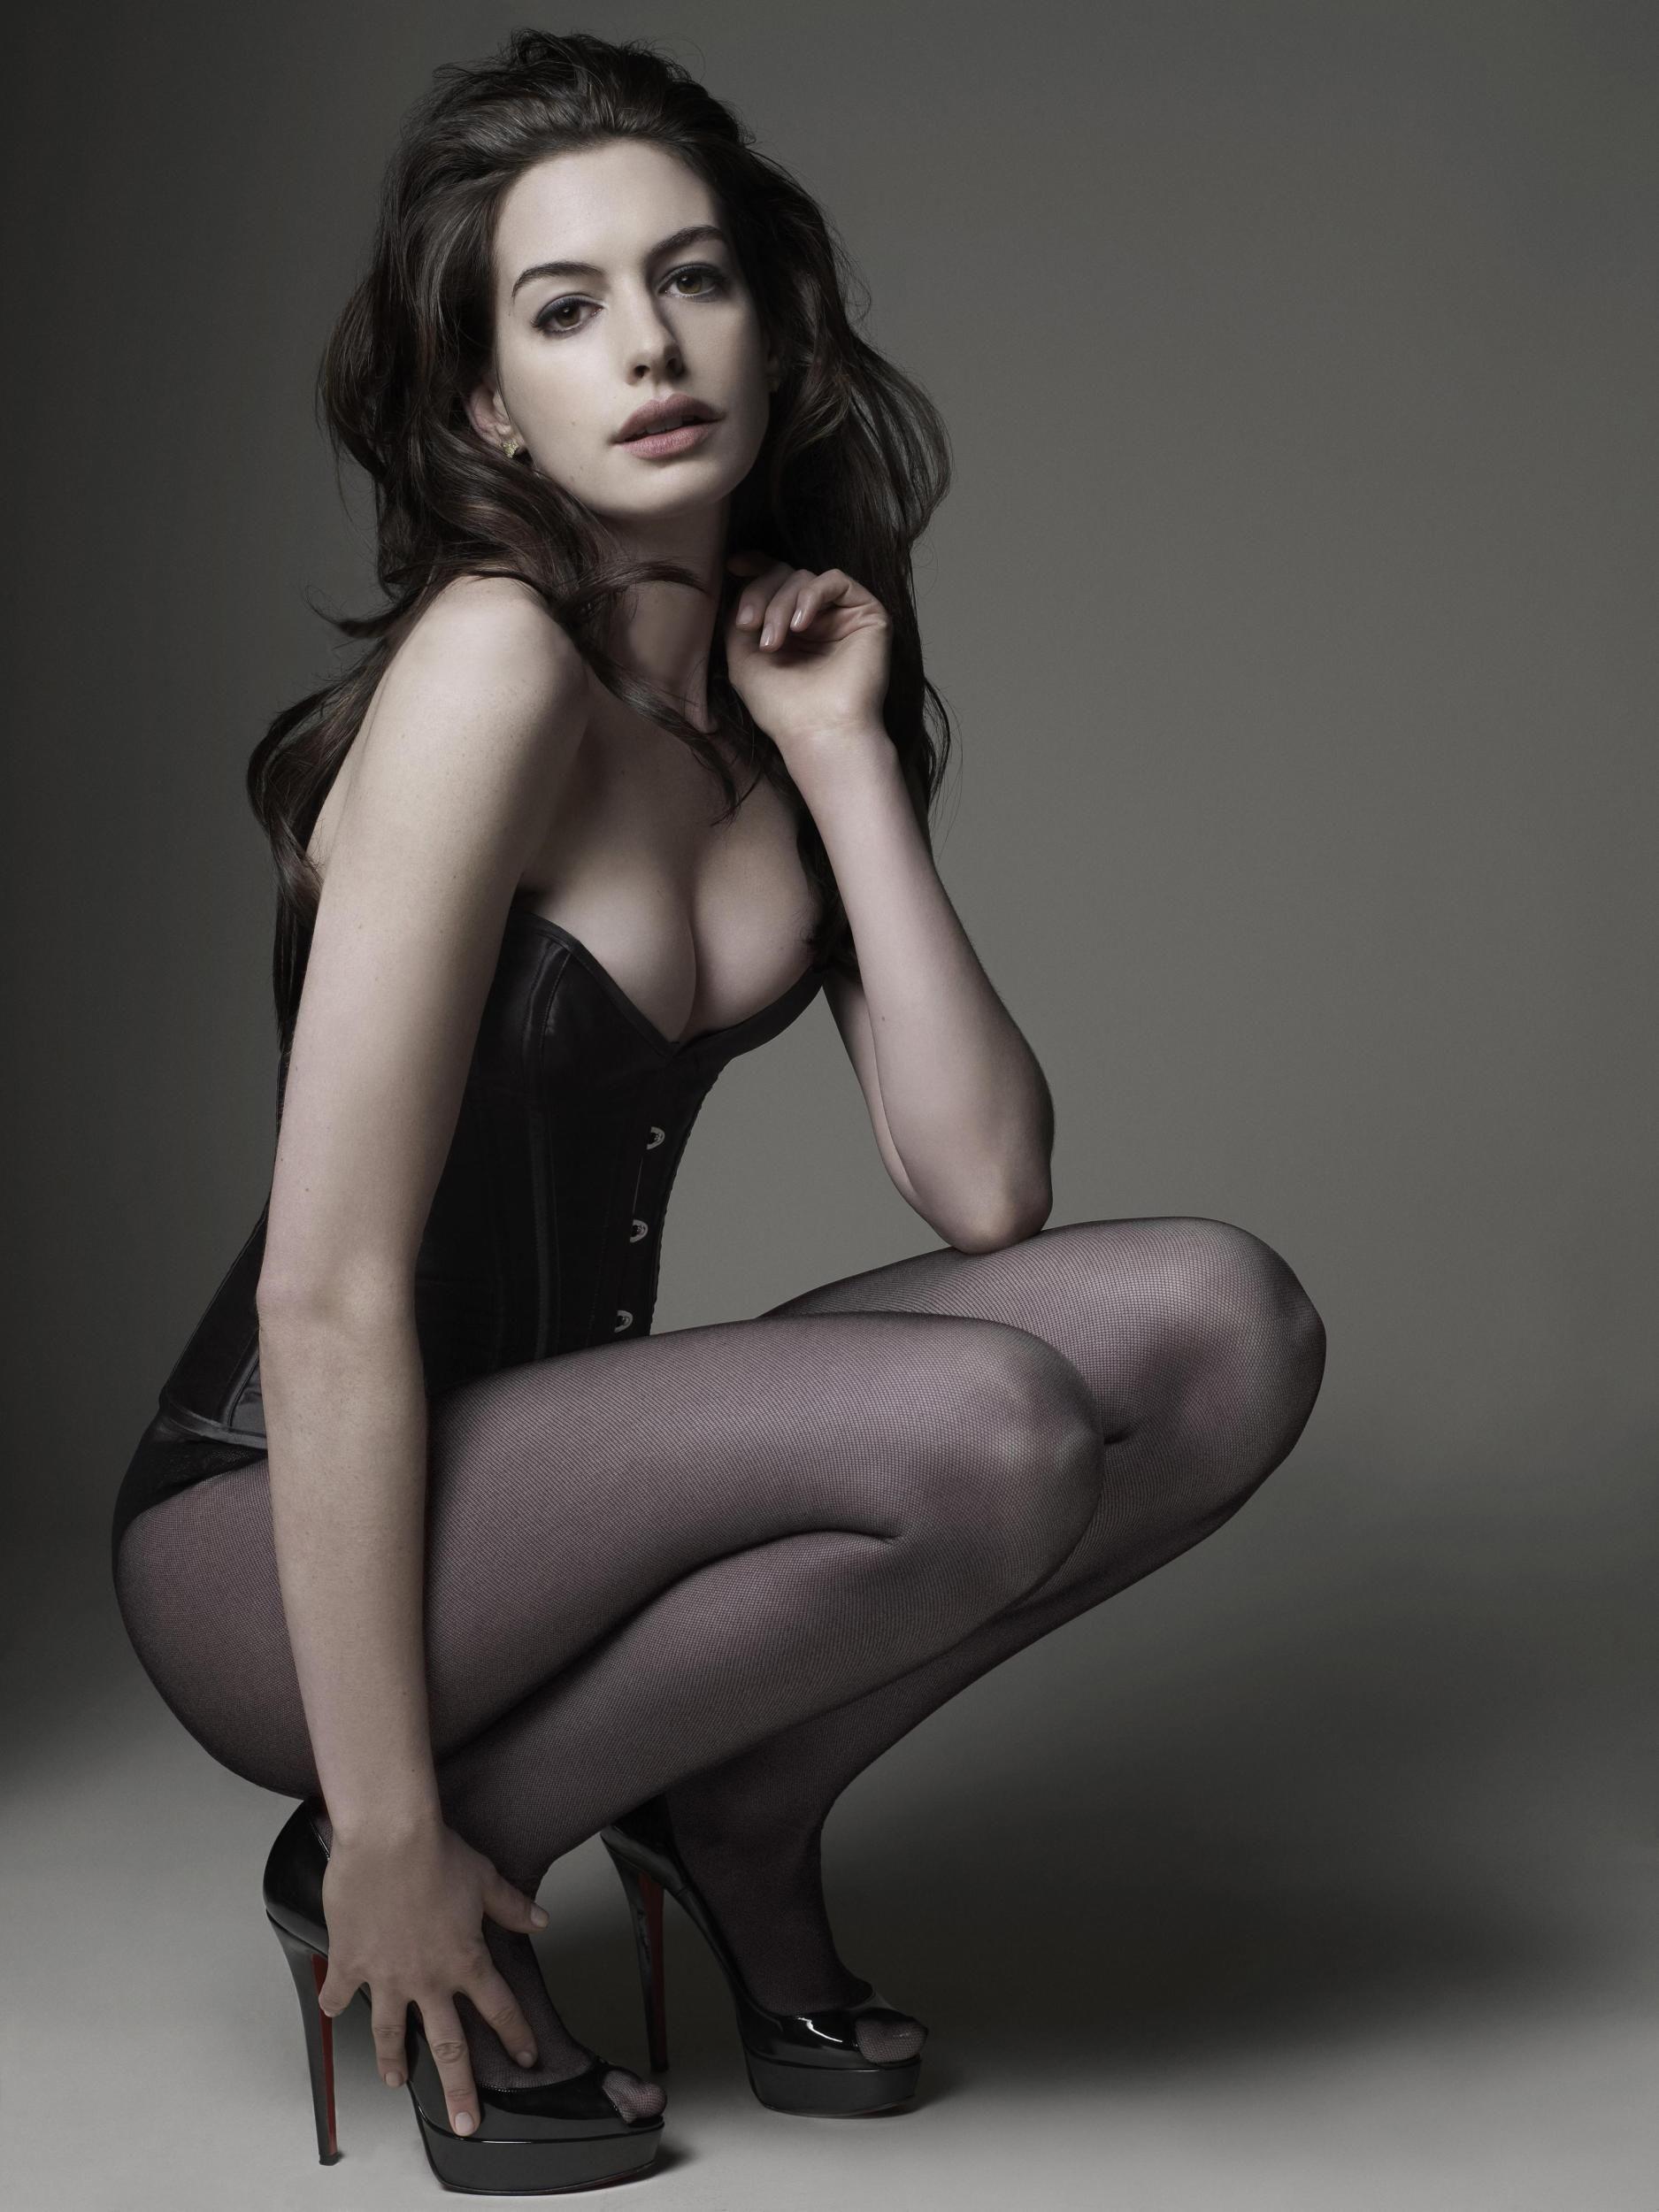 anne hathaway | model poses | pinterest | anne hathaway